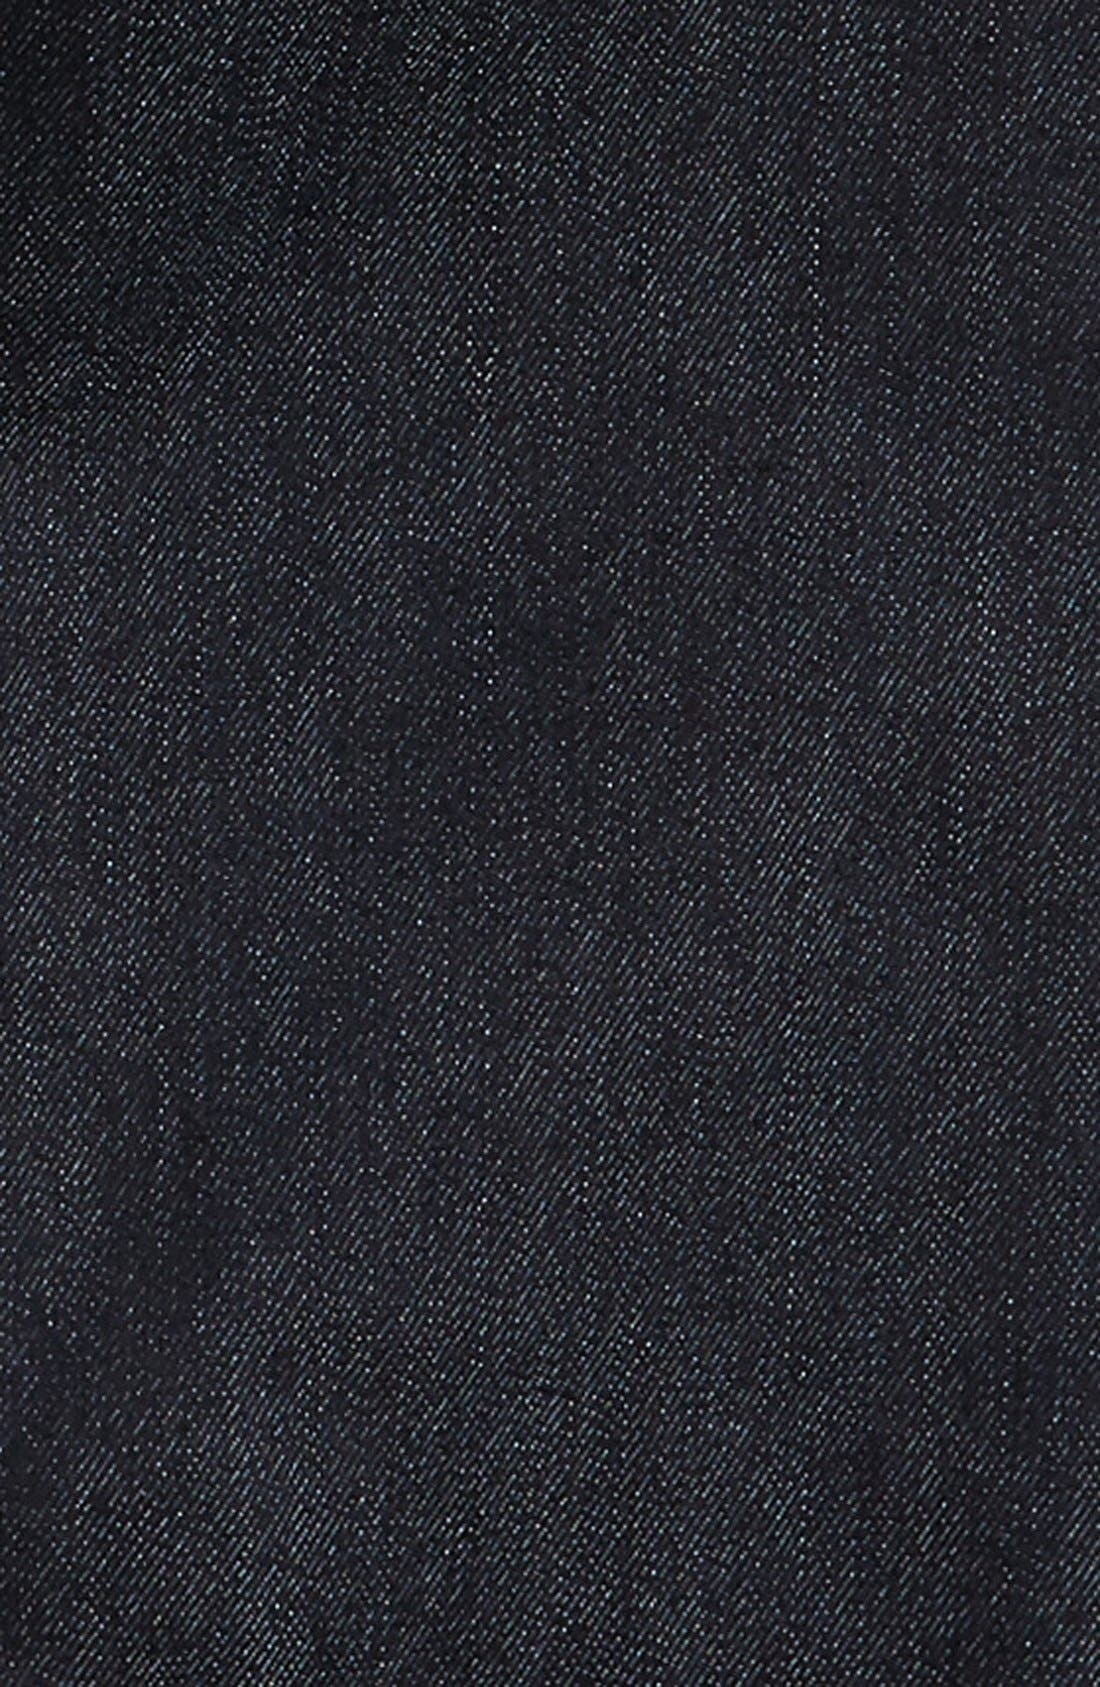 Brixton Straight Leg Jeans,                             Alternate thumbnail 5, color,